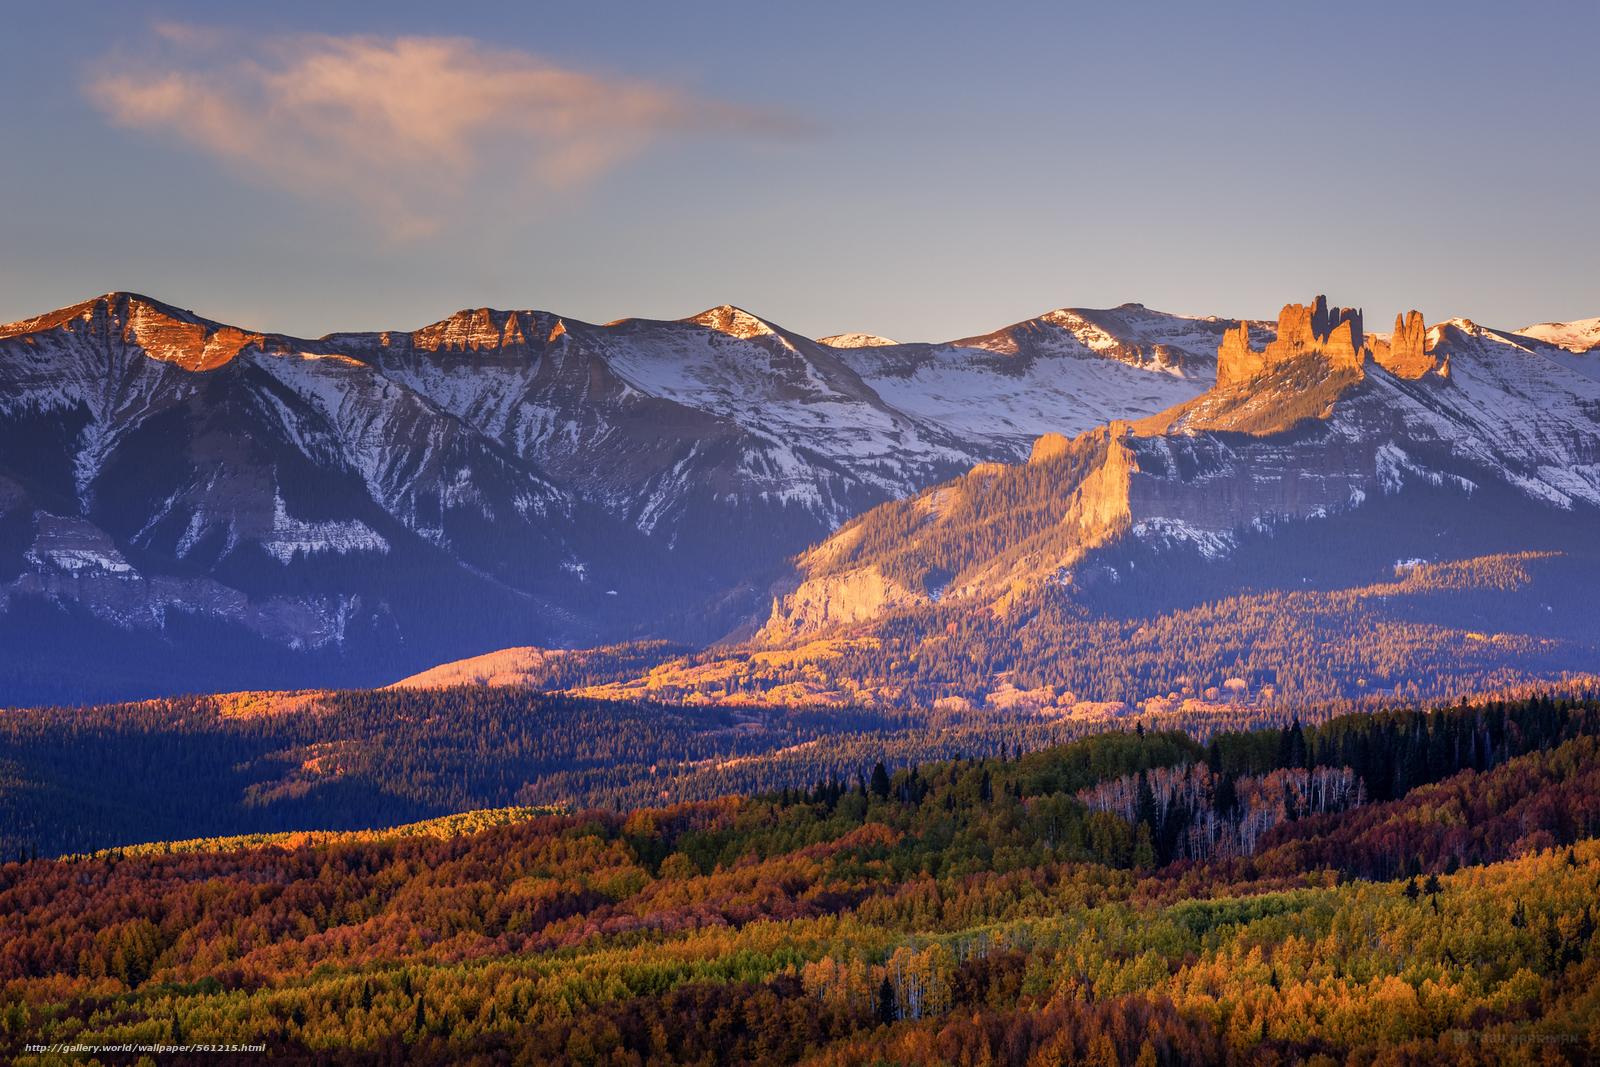 Red Mountain, Uncompahgre National Forest, Colorado  № 1563836 бесплатно